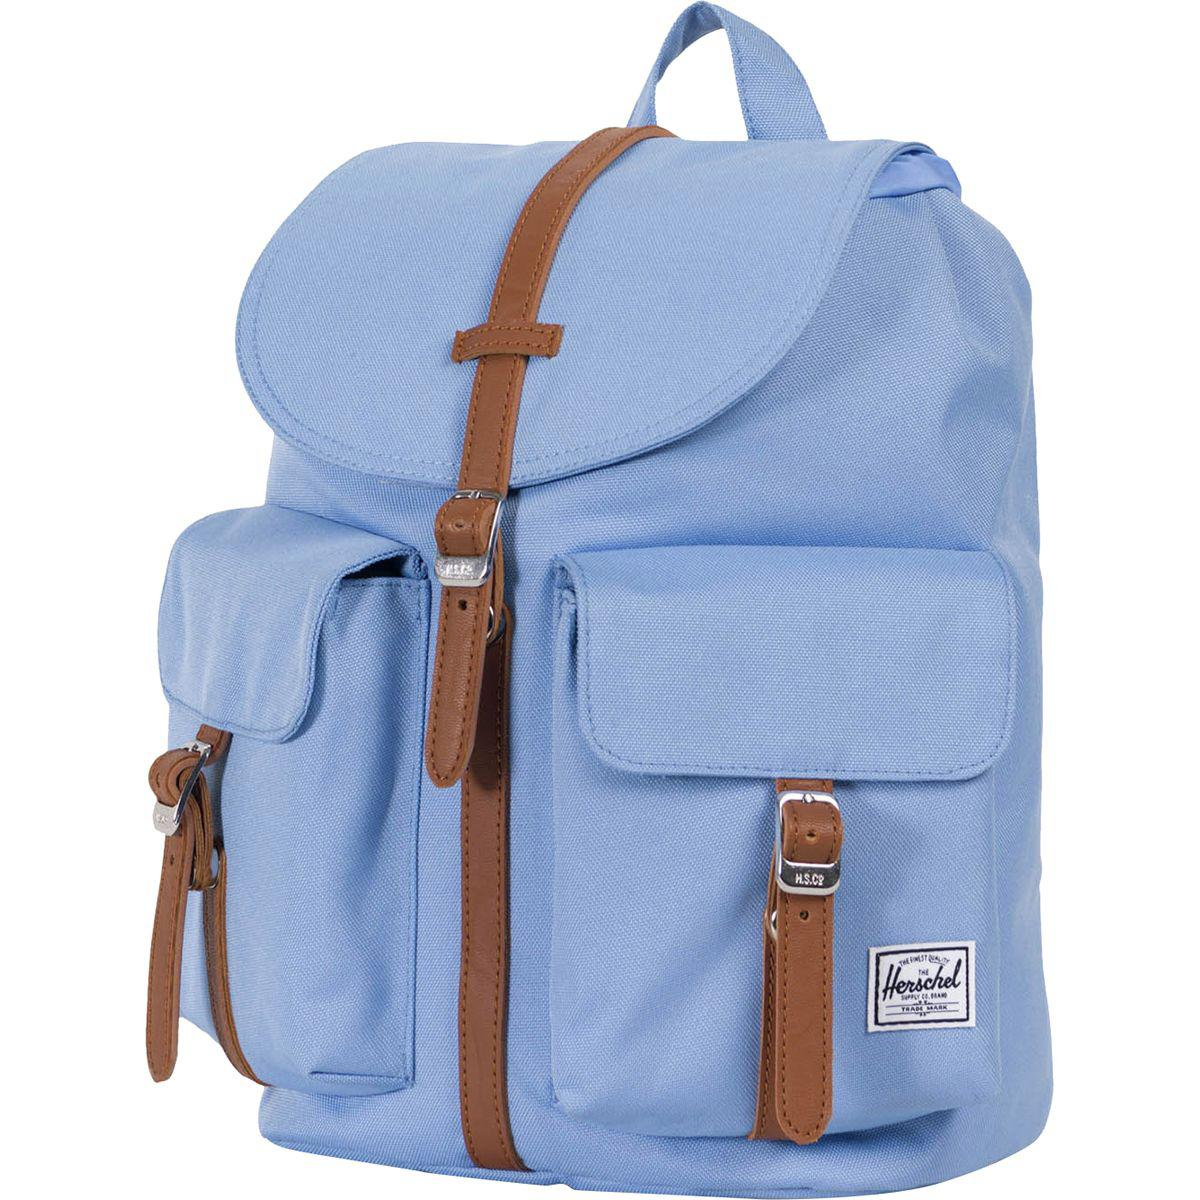 46956d37e45 Lyst - Herschel Supply Co. Dawson 13l Backpack in Blue